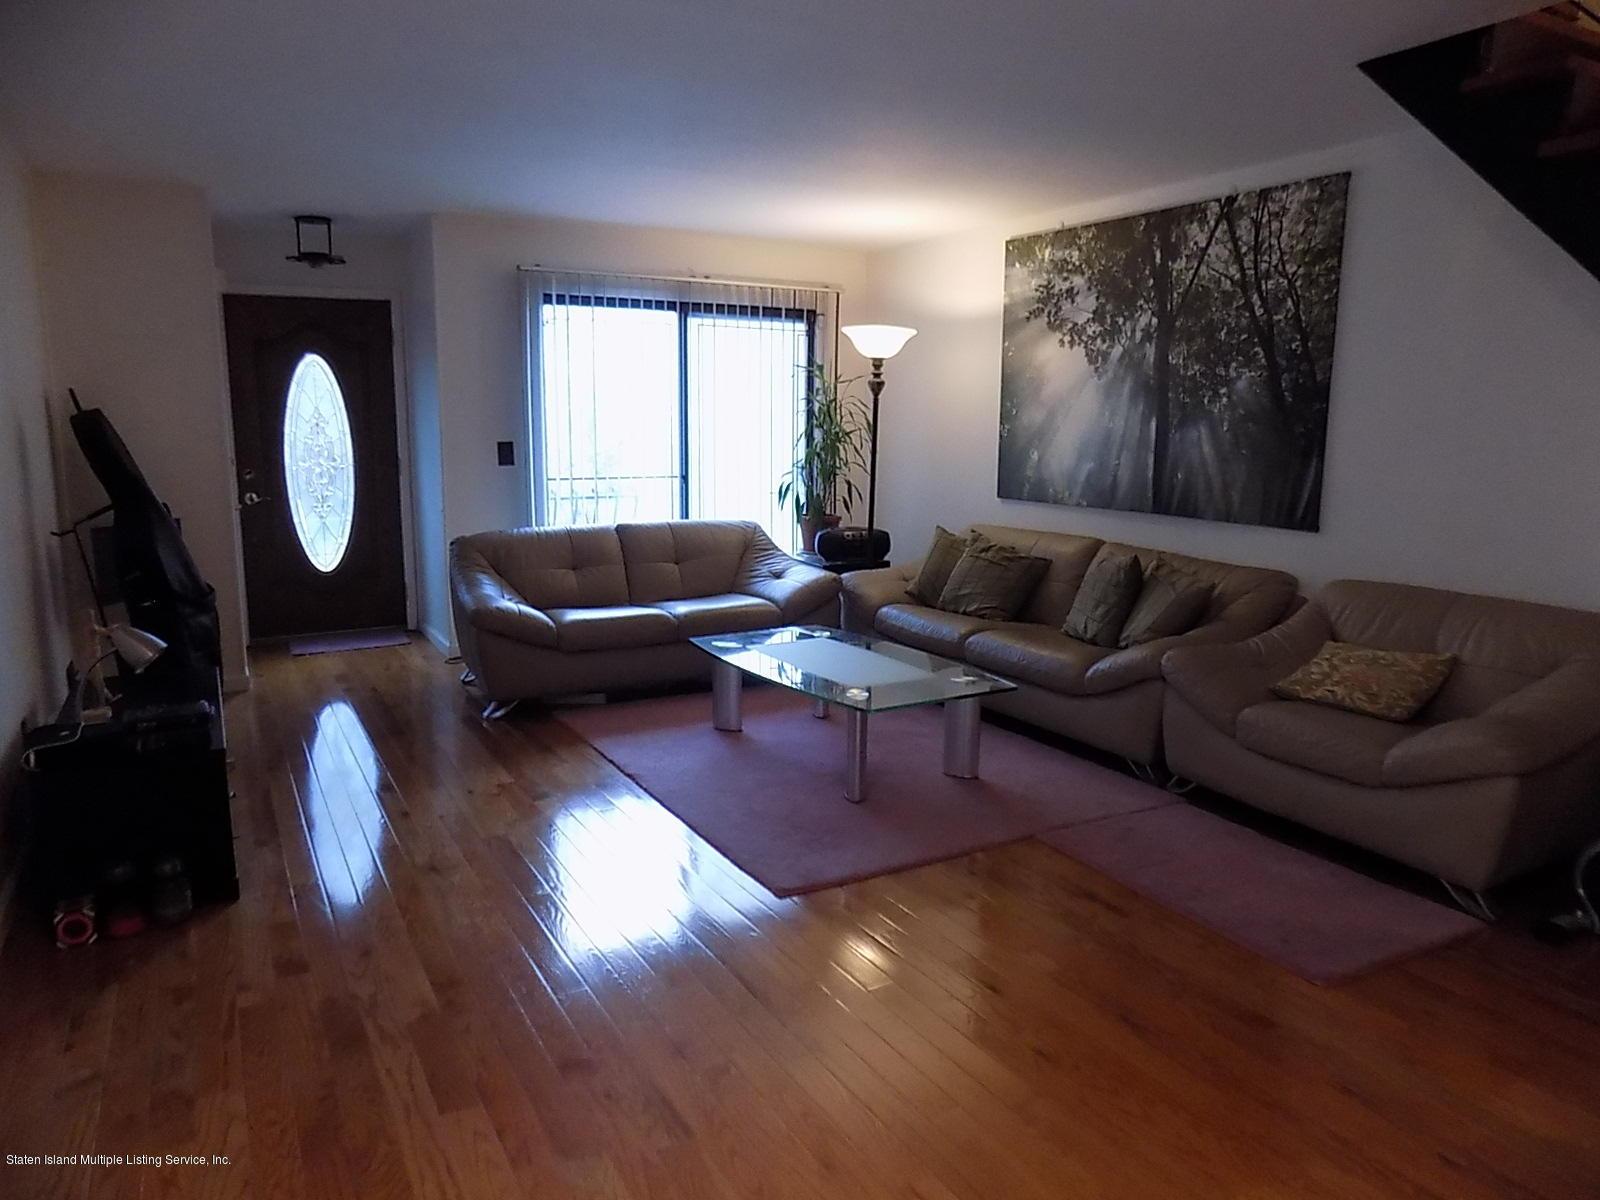 Single Family - Semi-Attached 85 Bogota Street  Staten Island, NY 10314, MLS-1126026-6